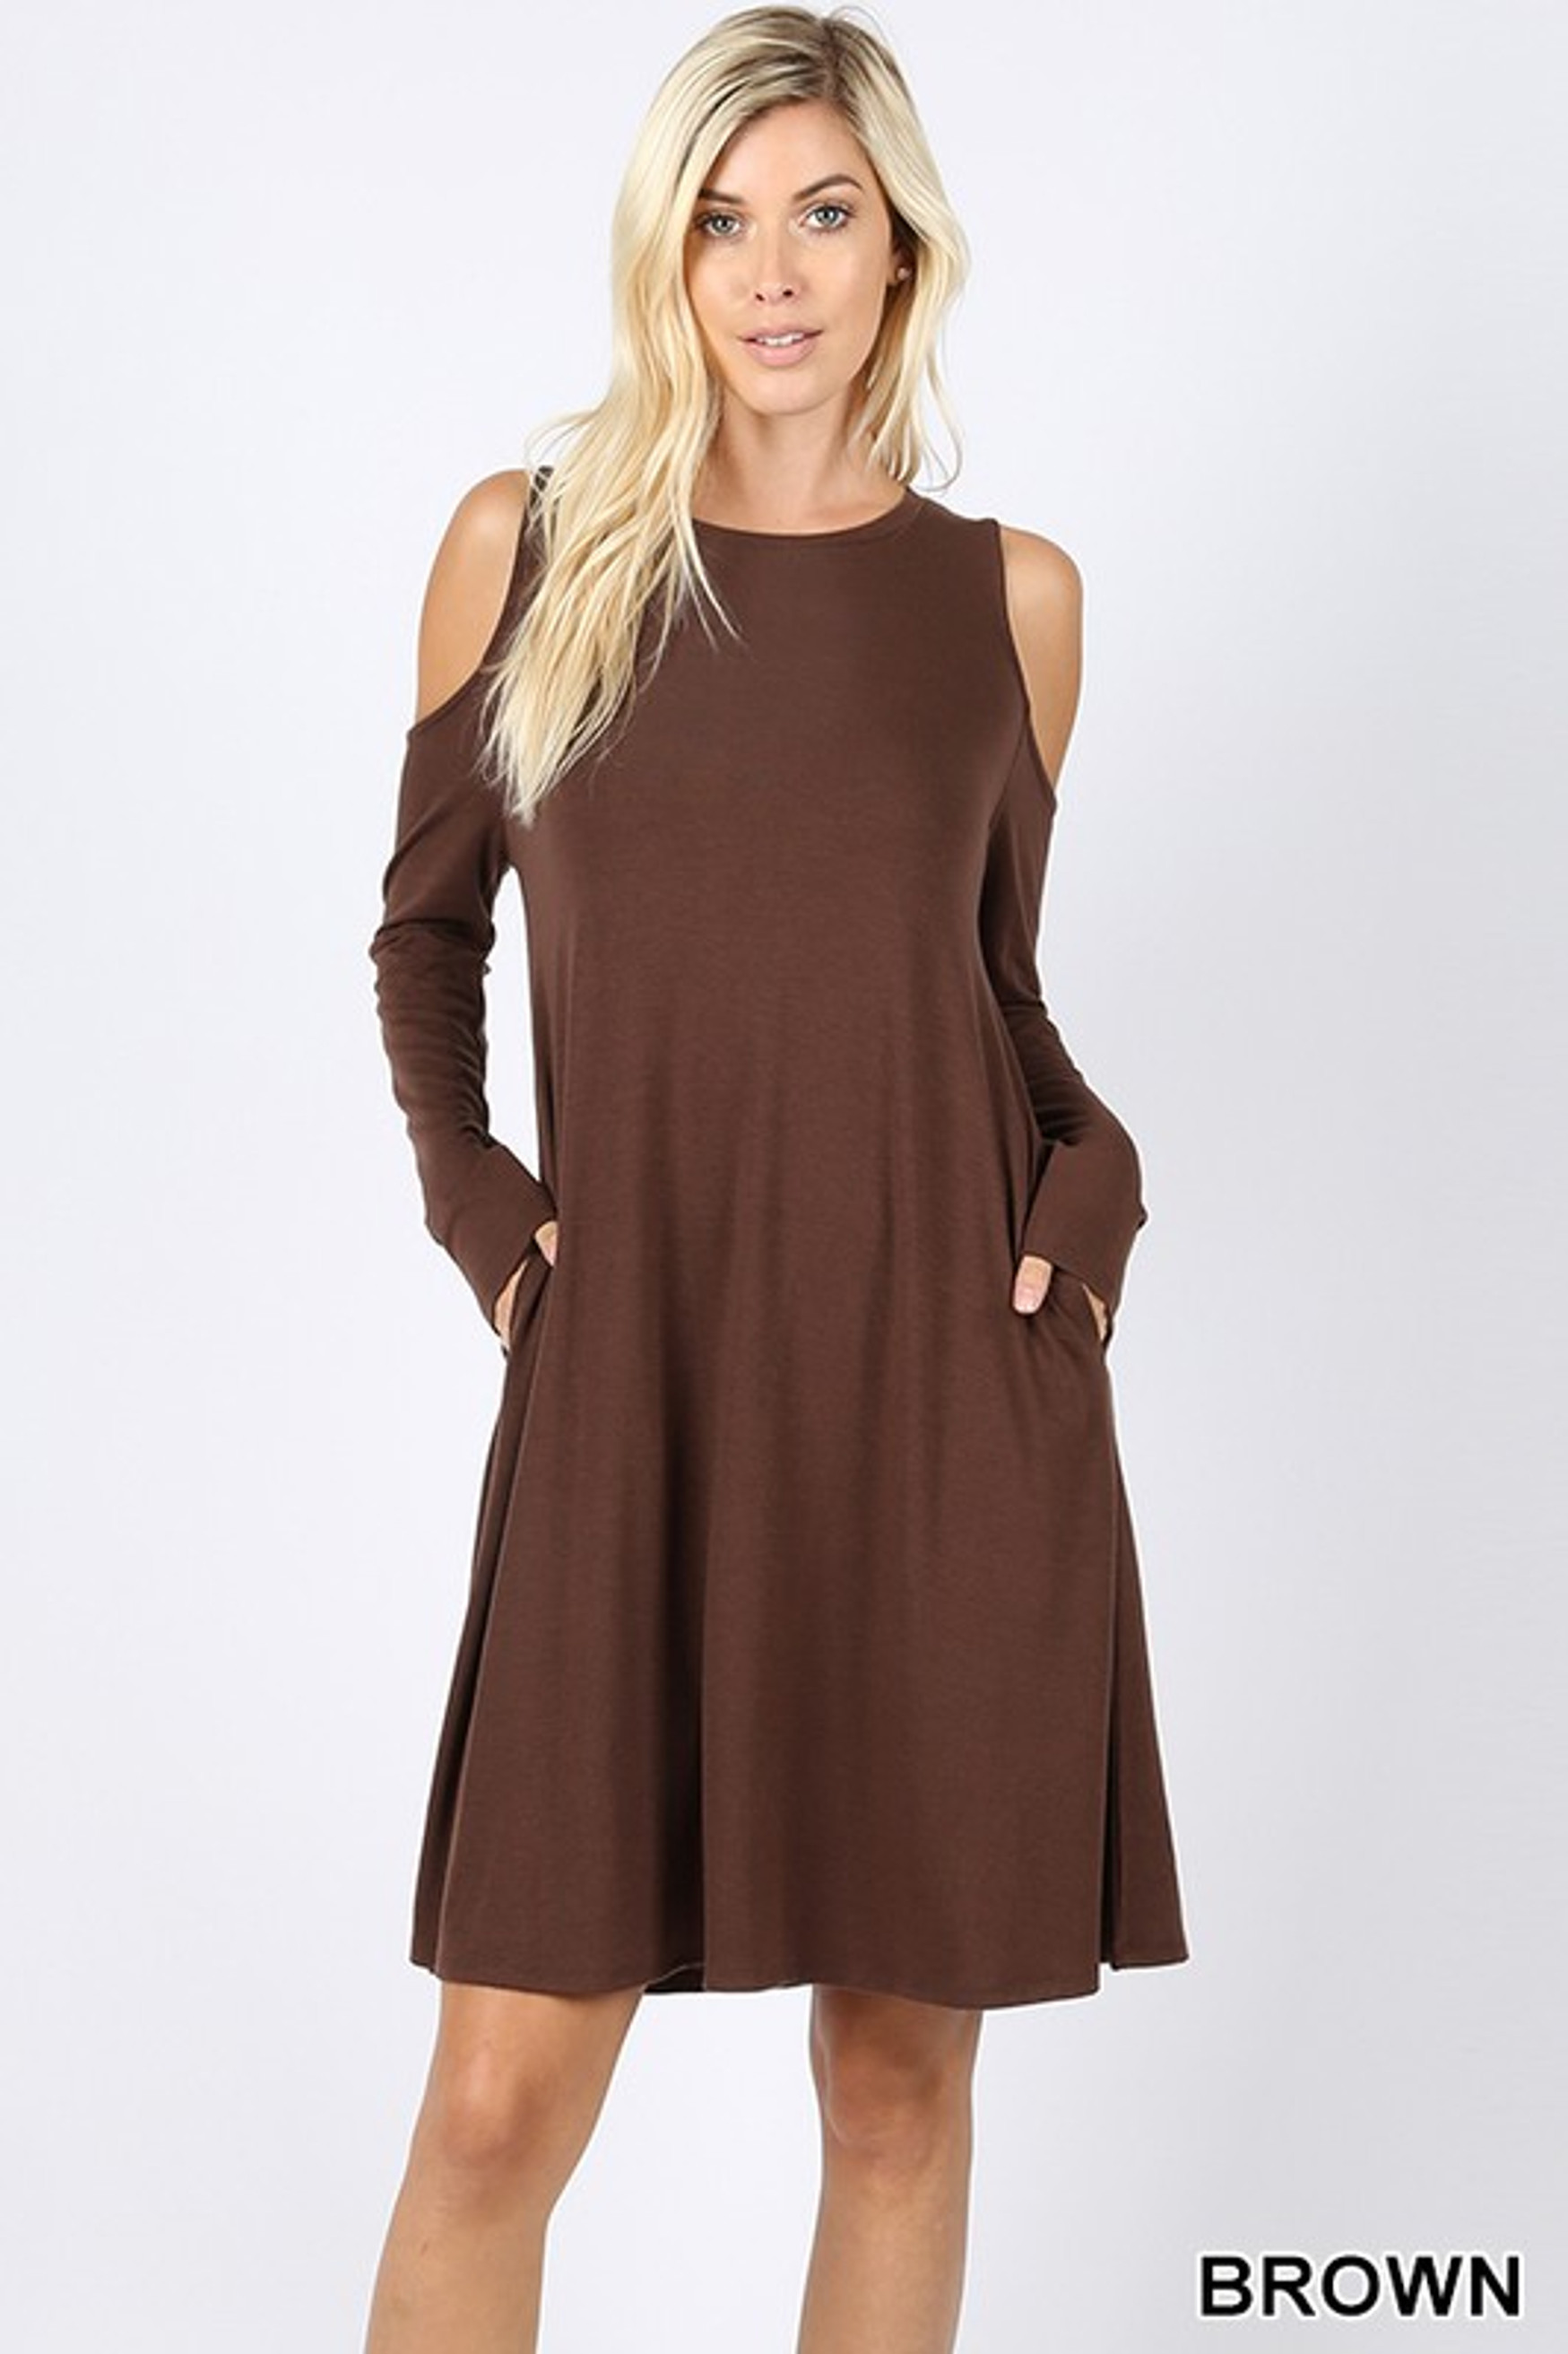 Premium Long Sleeve Cold Shoulder Dress with Pockets